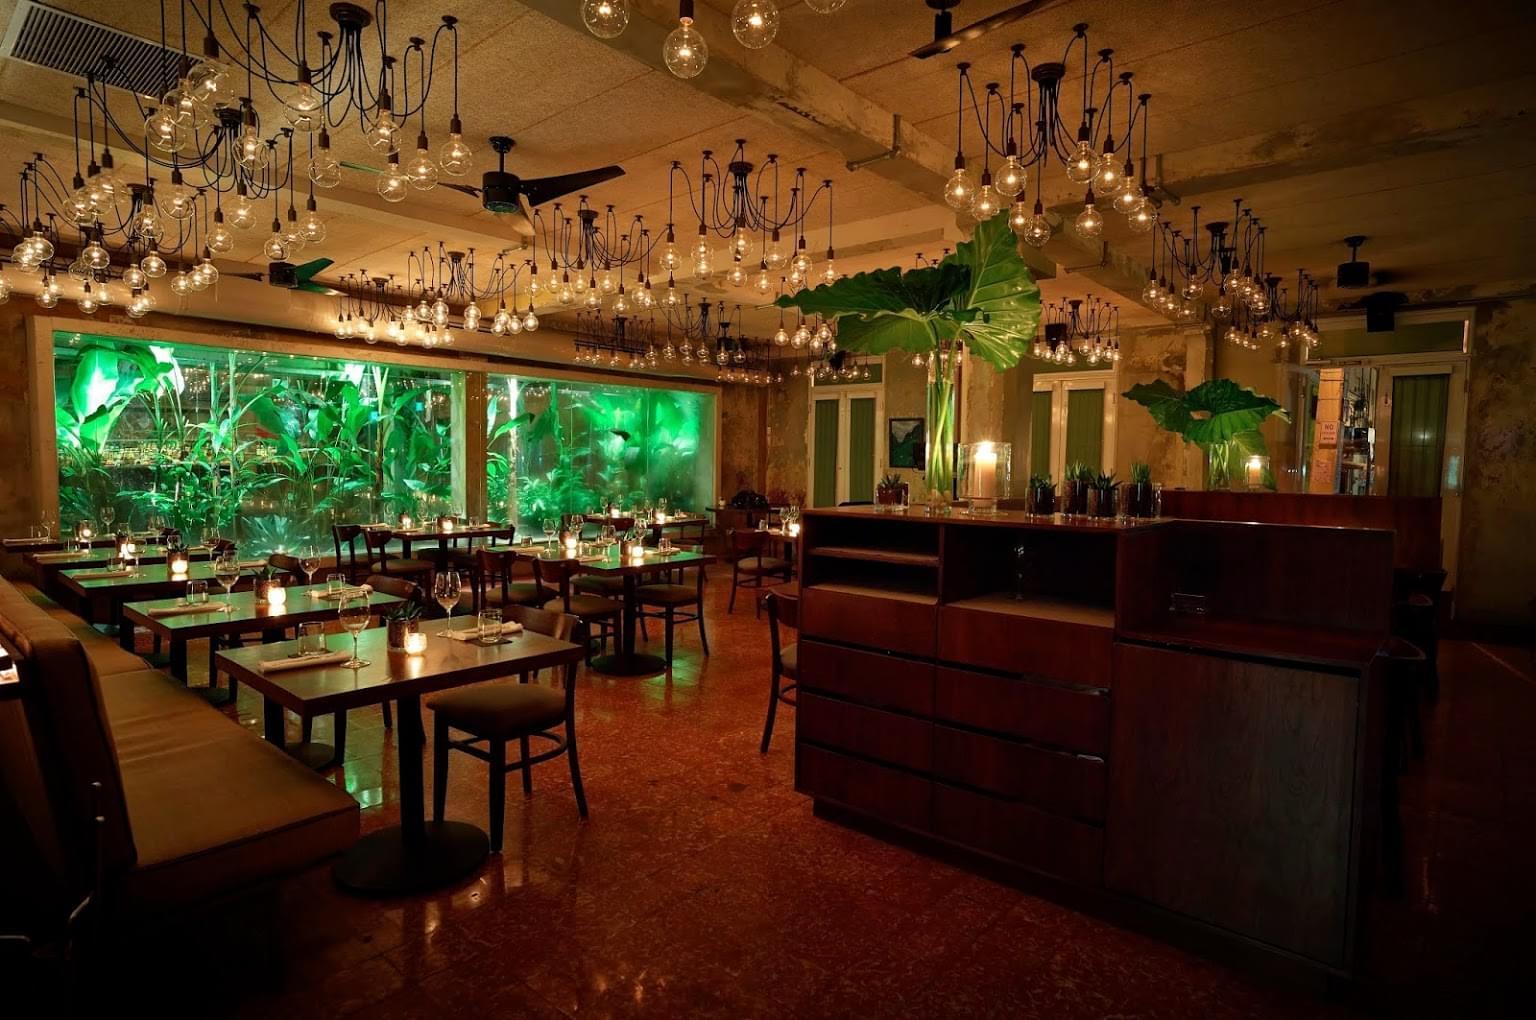 Santaella Calle Canals San Juan Puerto Rico Caribbean Restaurant Interior Google Business View Interactive Tour Merchant View 360